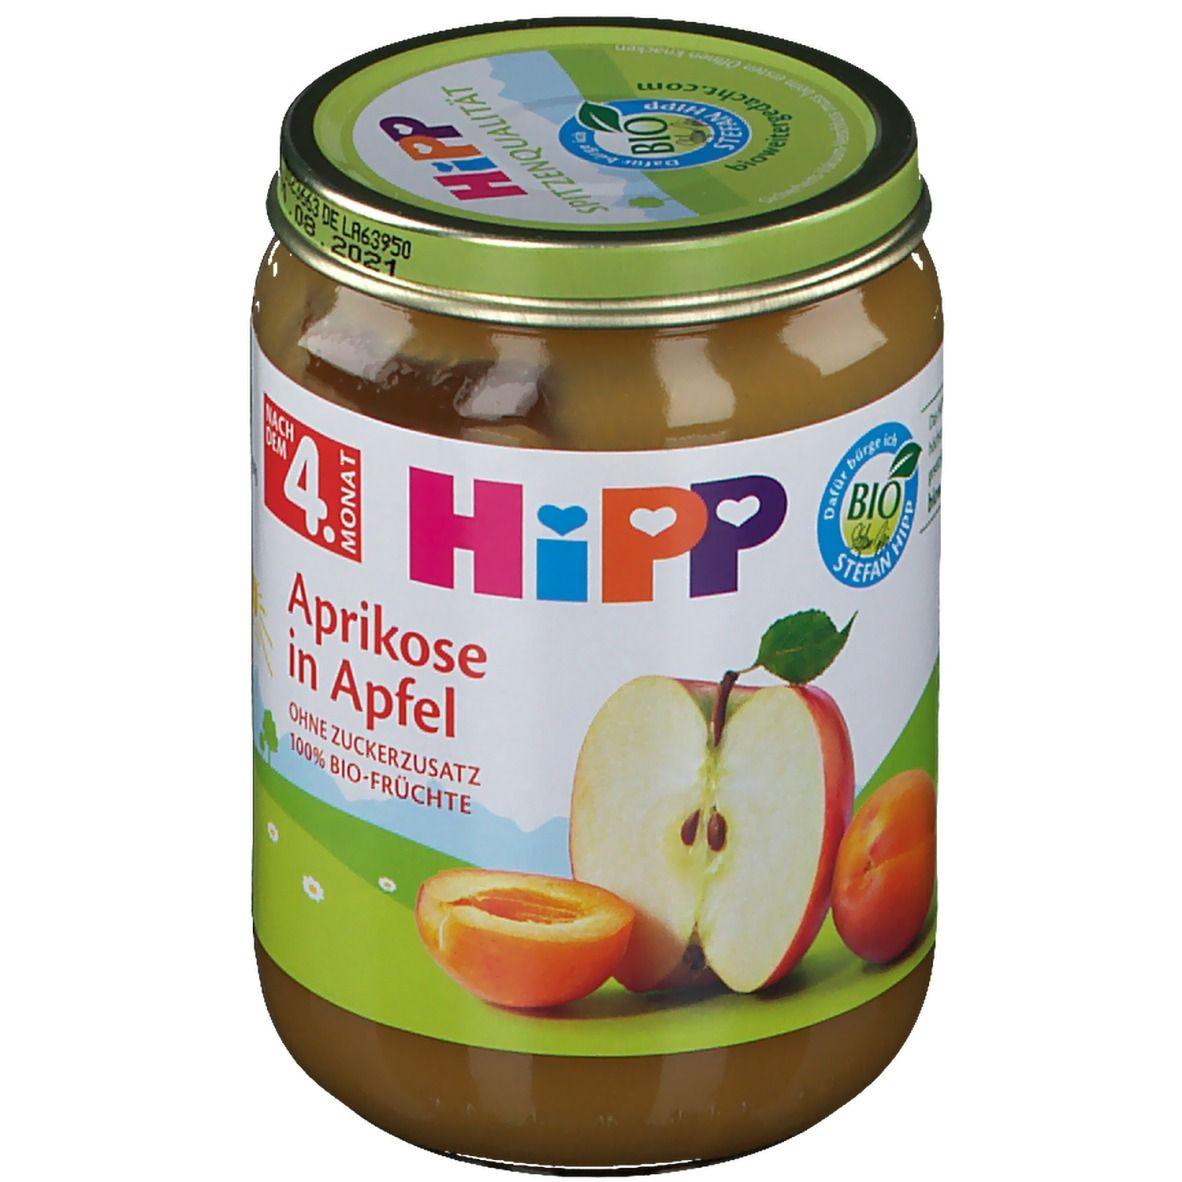 HiPP Aprikose in Apfel